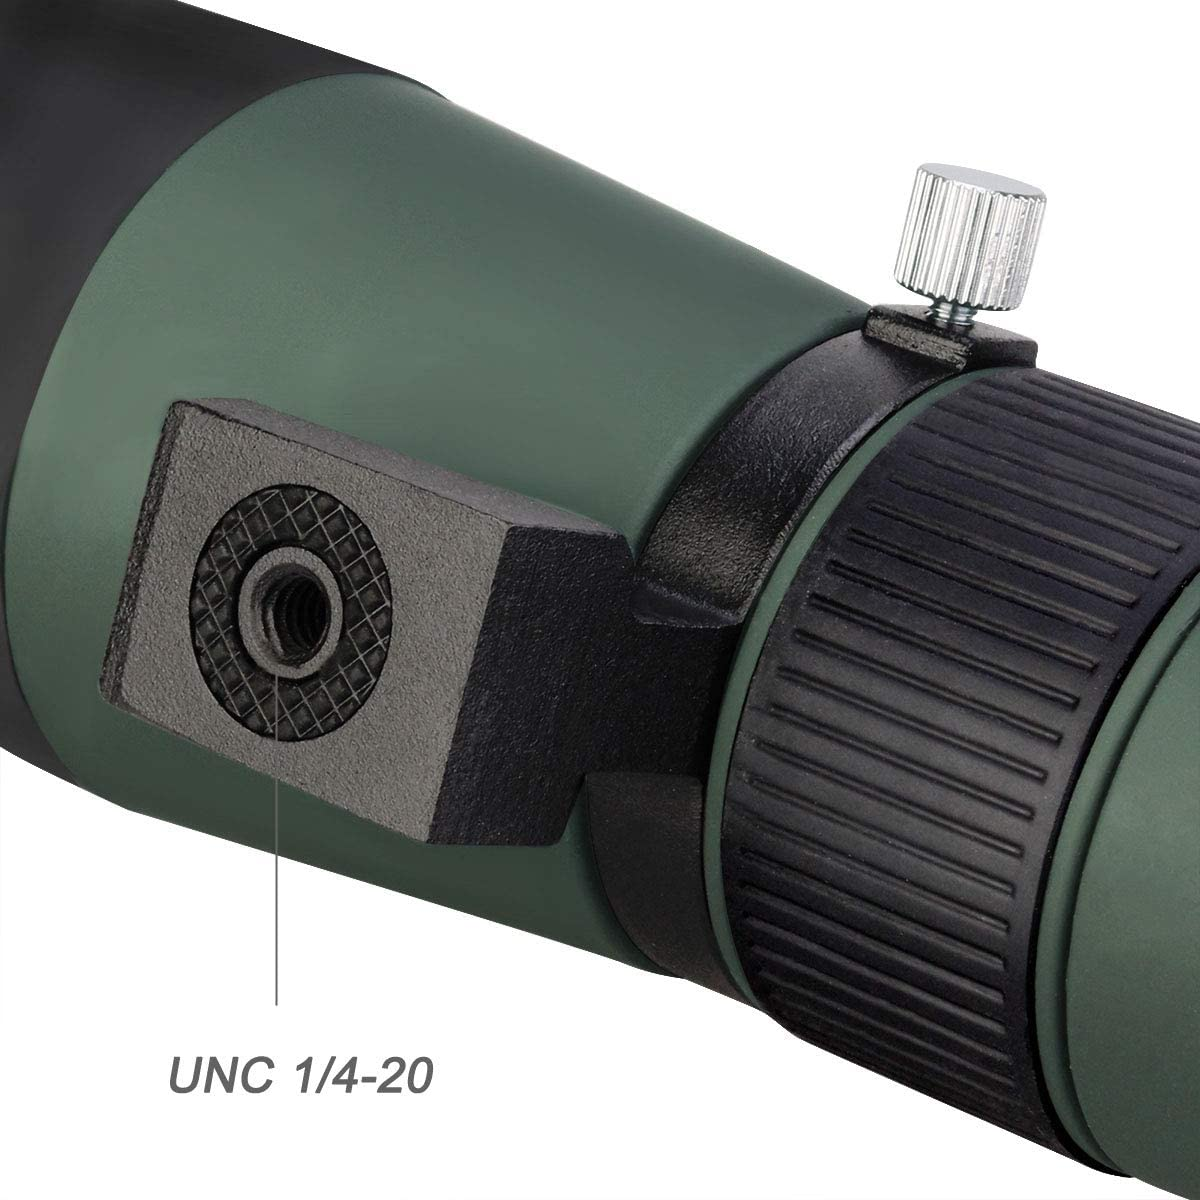 Svbony SV404 Telescopio Terrestre 16x50 Mini Telescopio Monocular ...